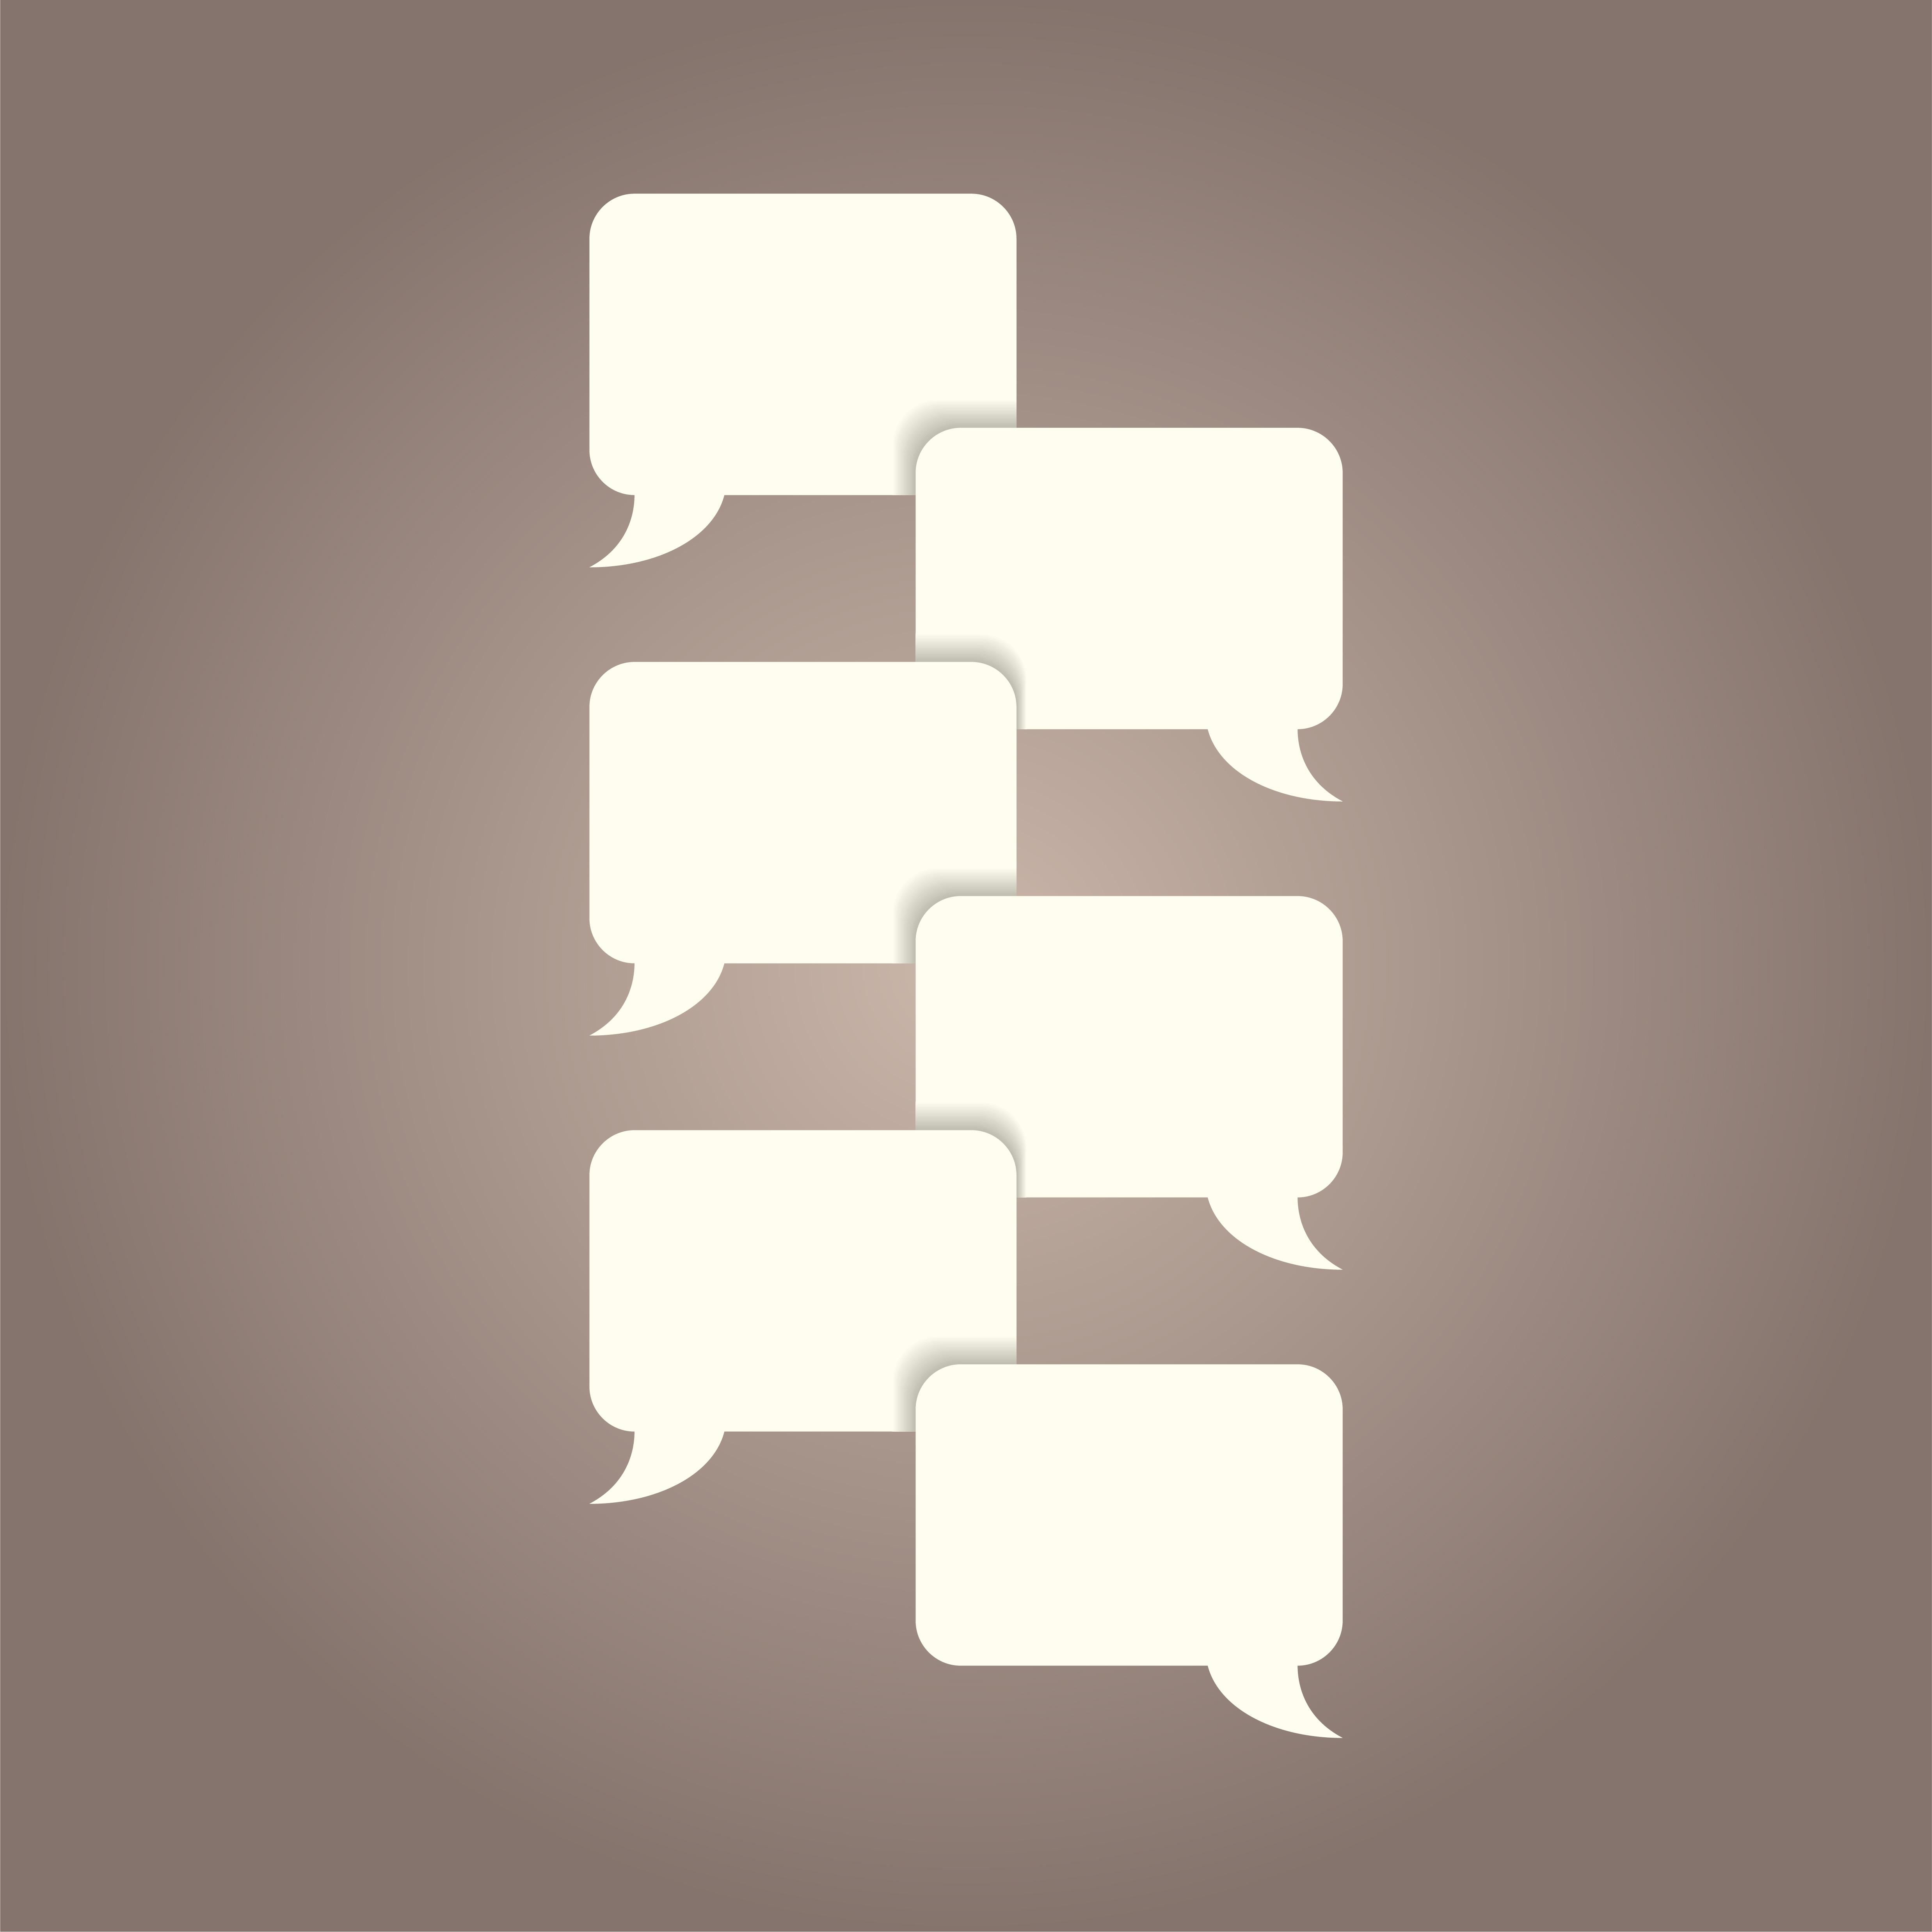 Restorative Dialogue